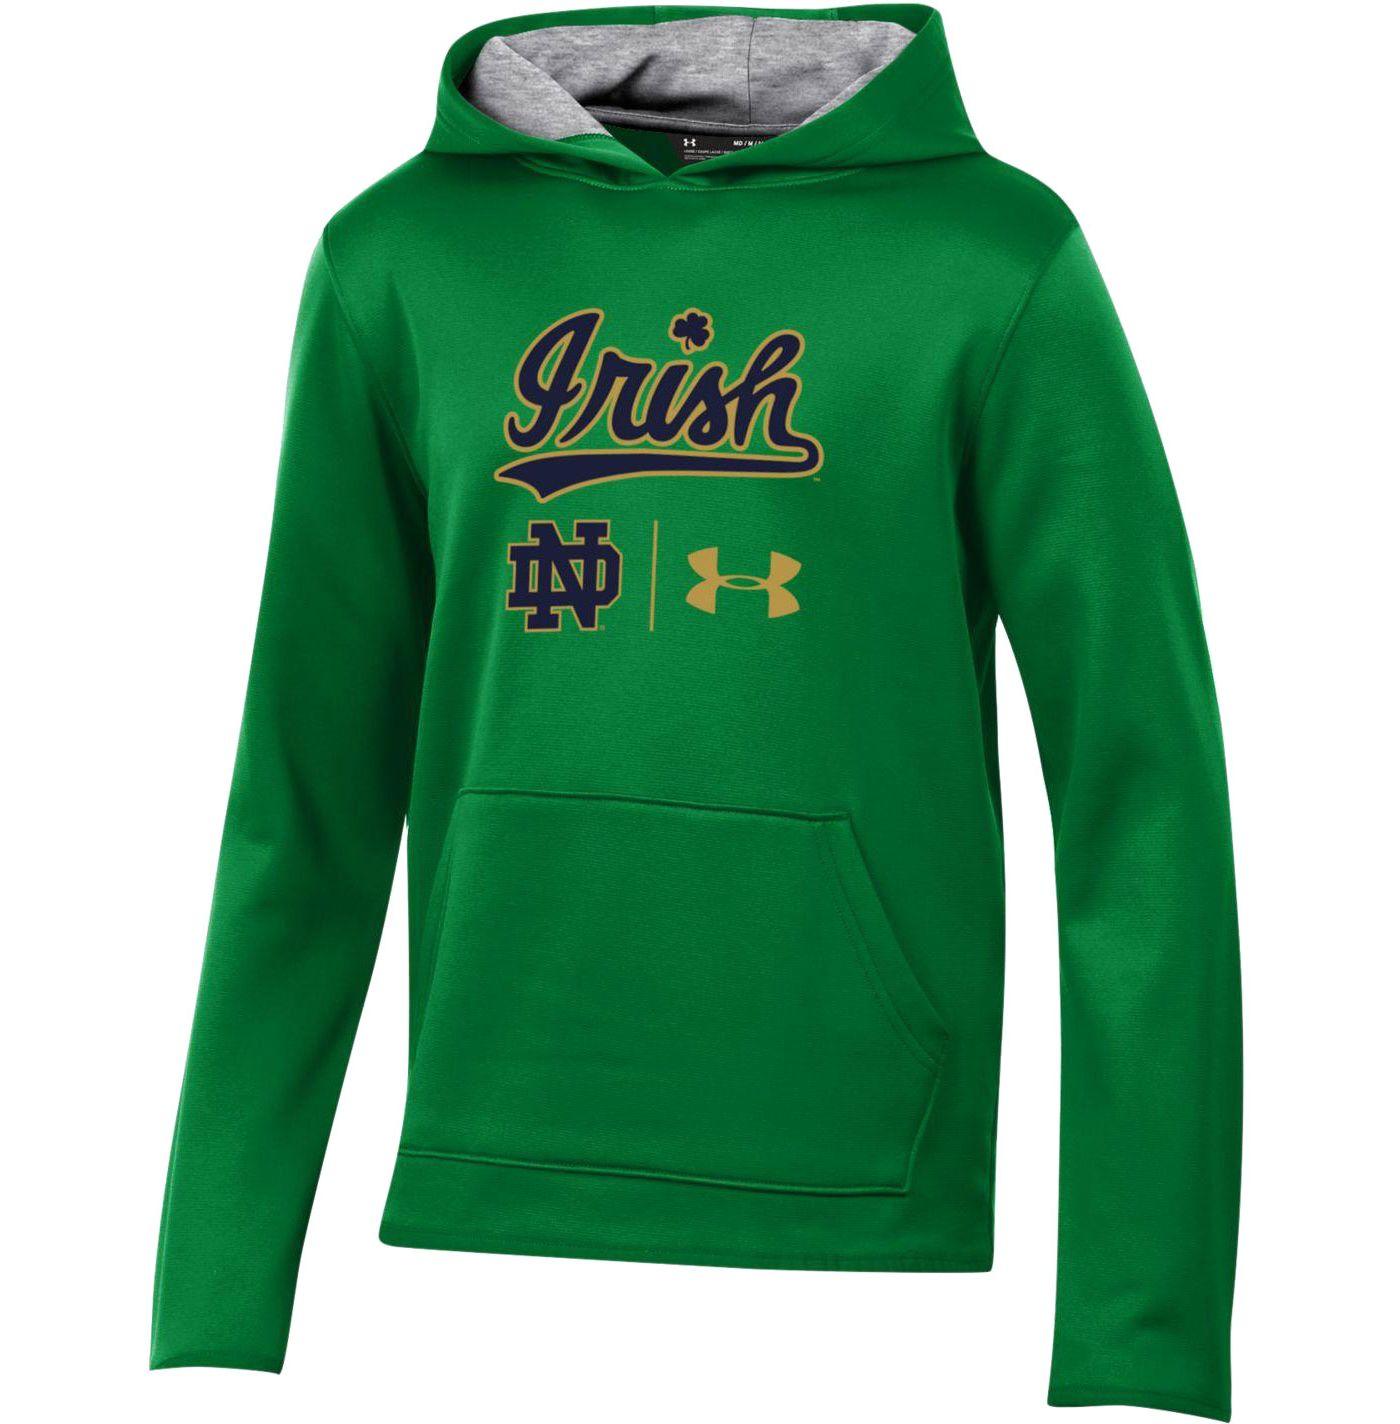 Under Armour Youth Notre Dame Fighting Irish 'Irish Wear Green' Armourfleece Pullover Performance Hoodie